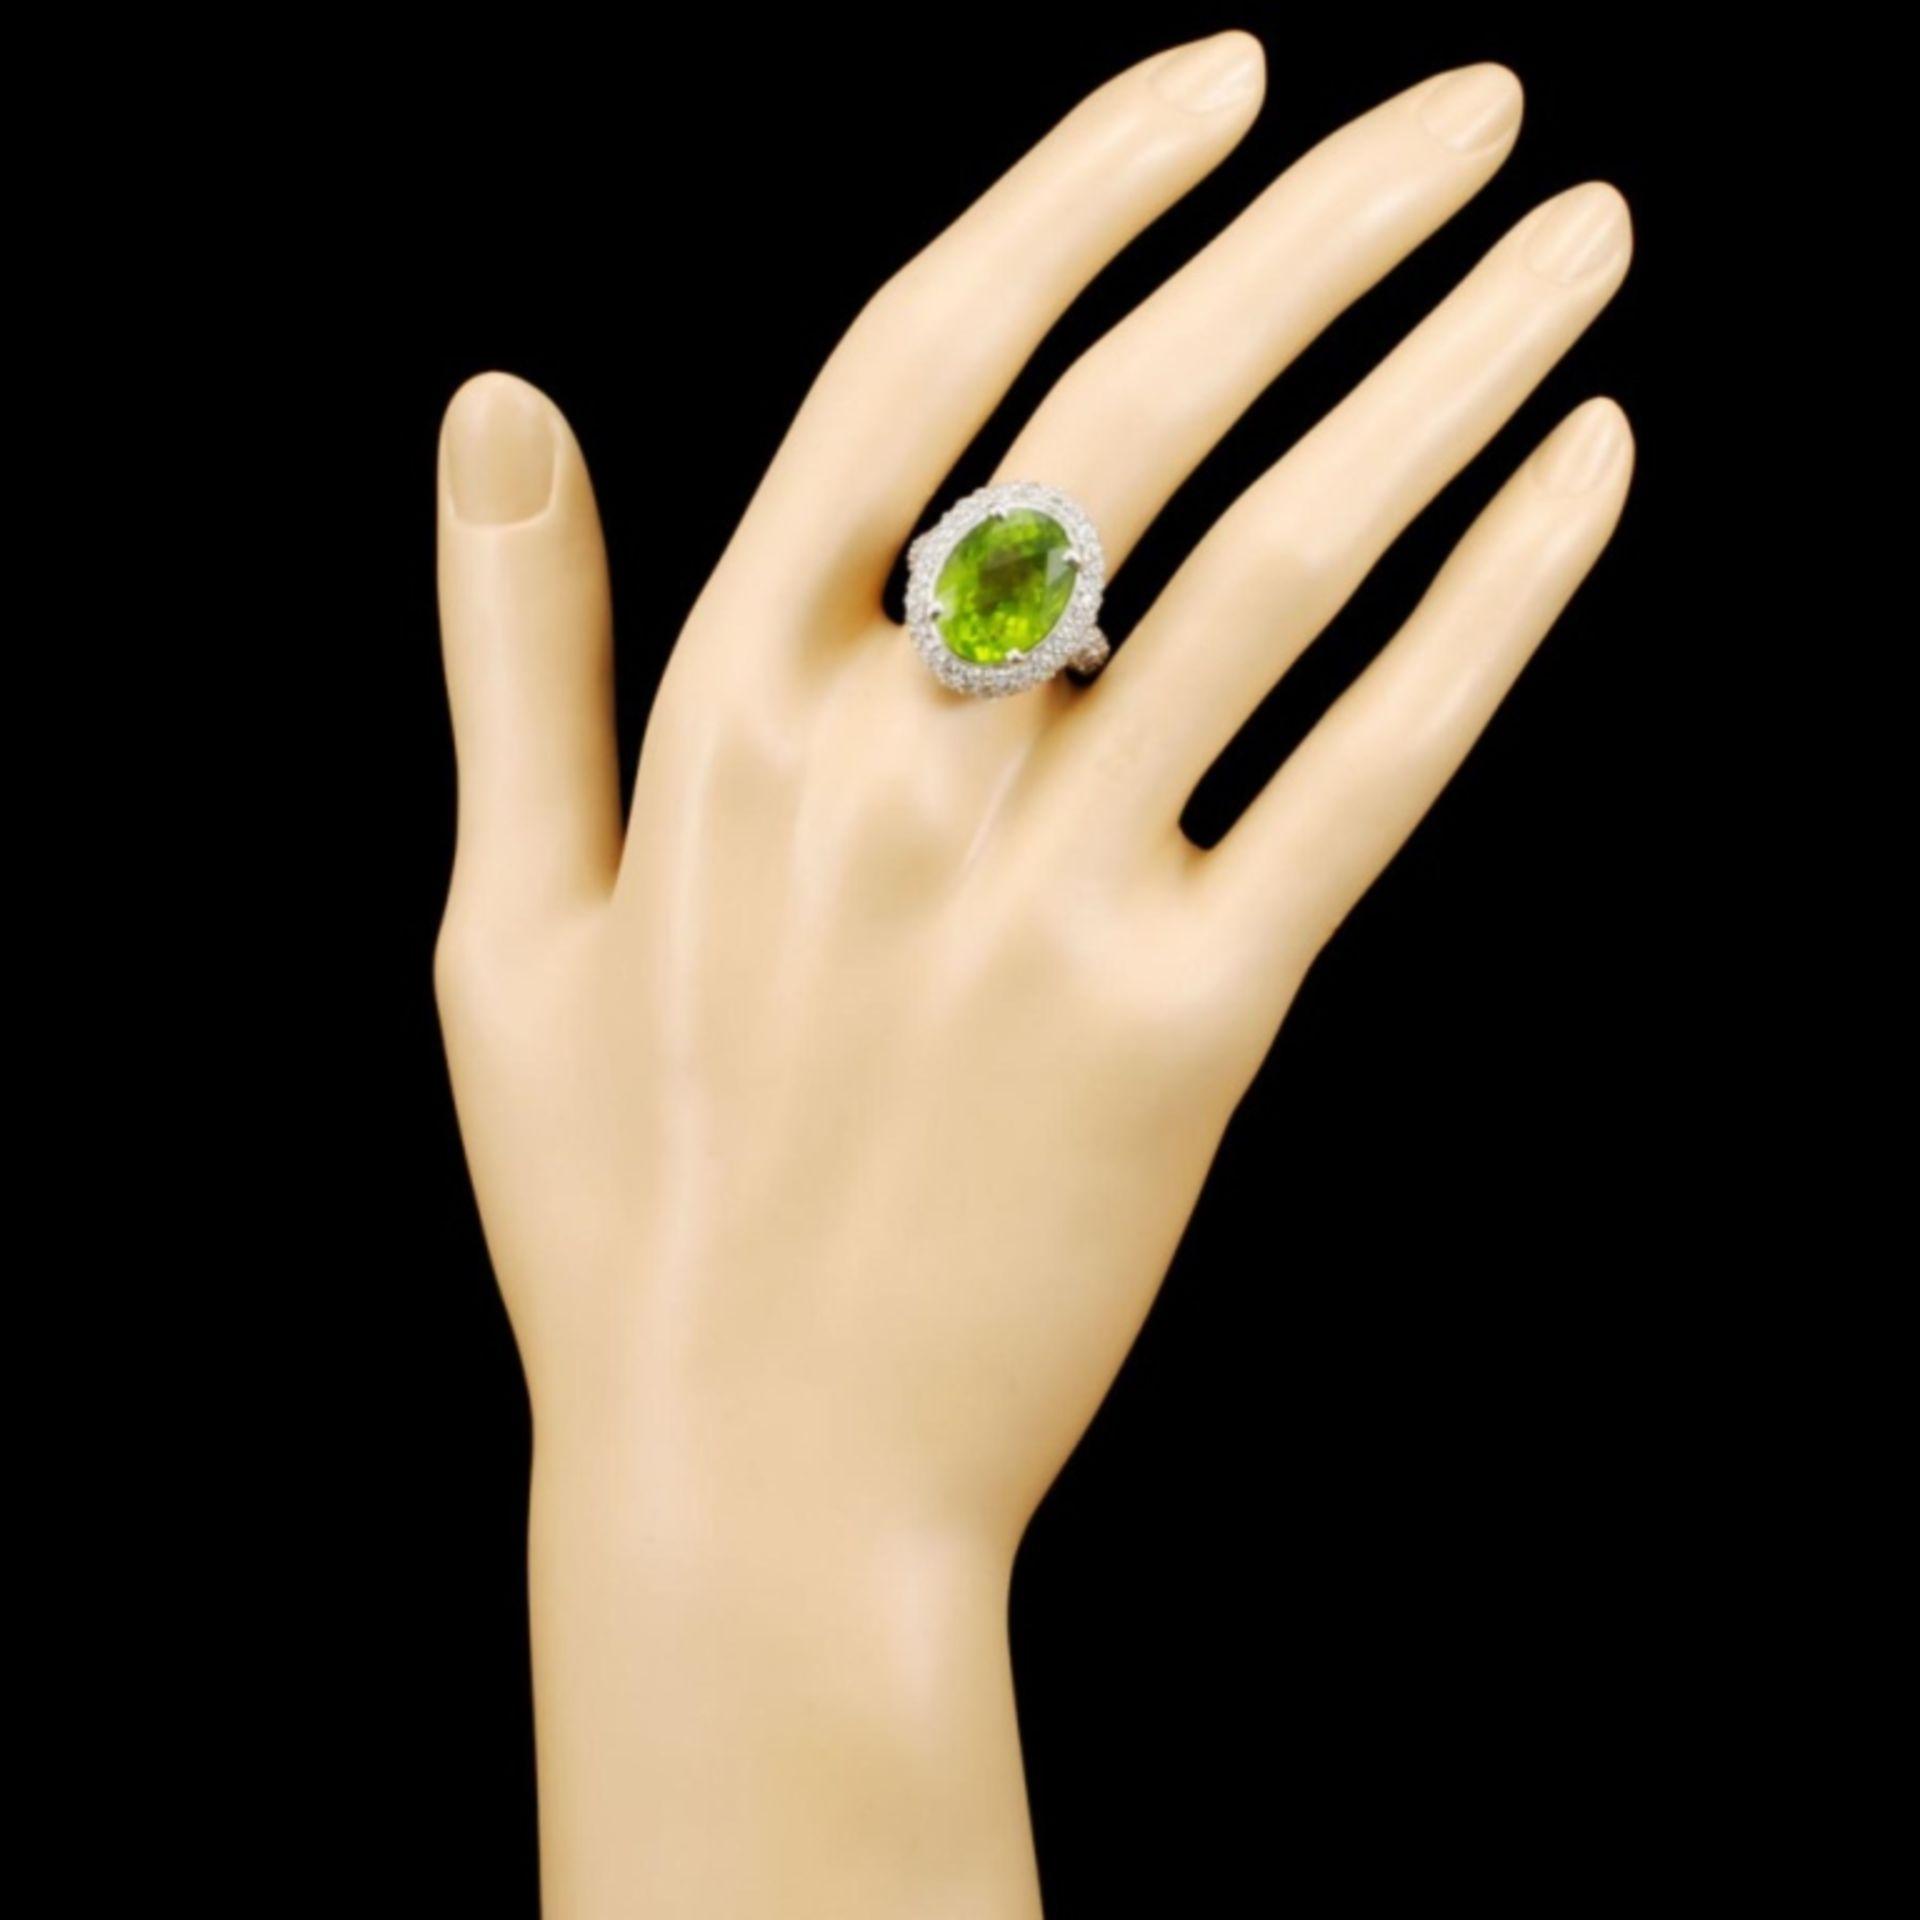 14K Gold 9.28ct Peridot & 2.40ctw Diamond Ring - Image 4 of 5